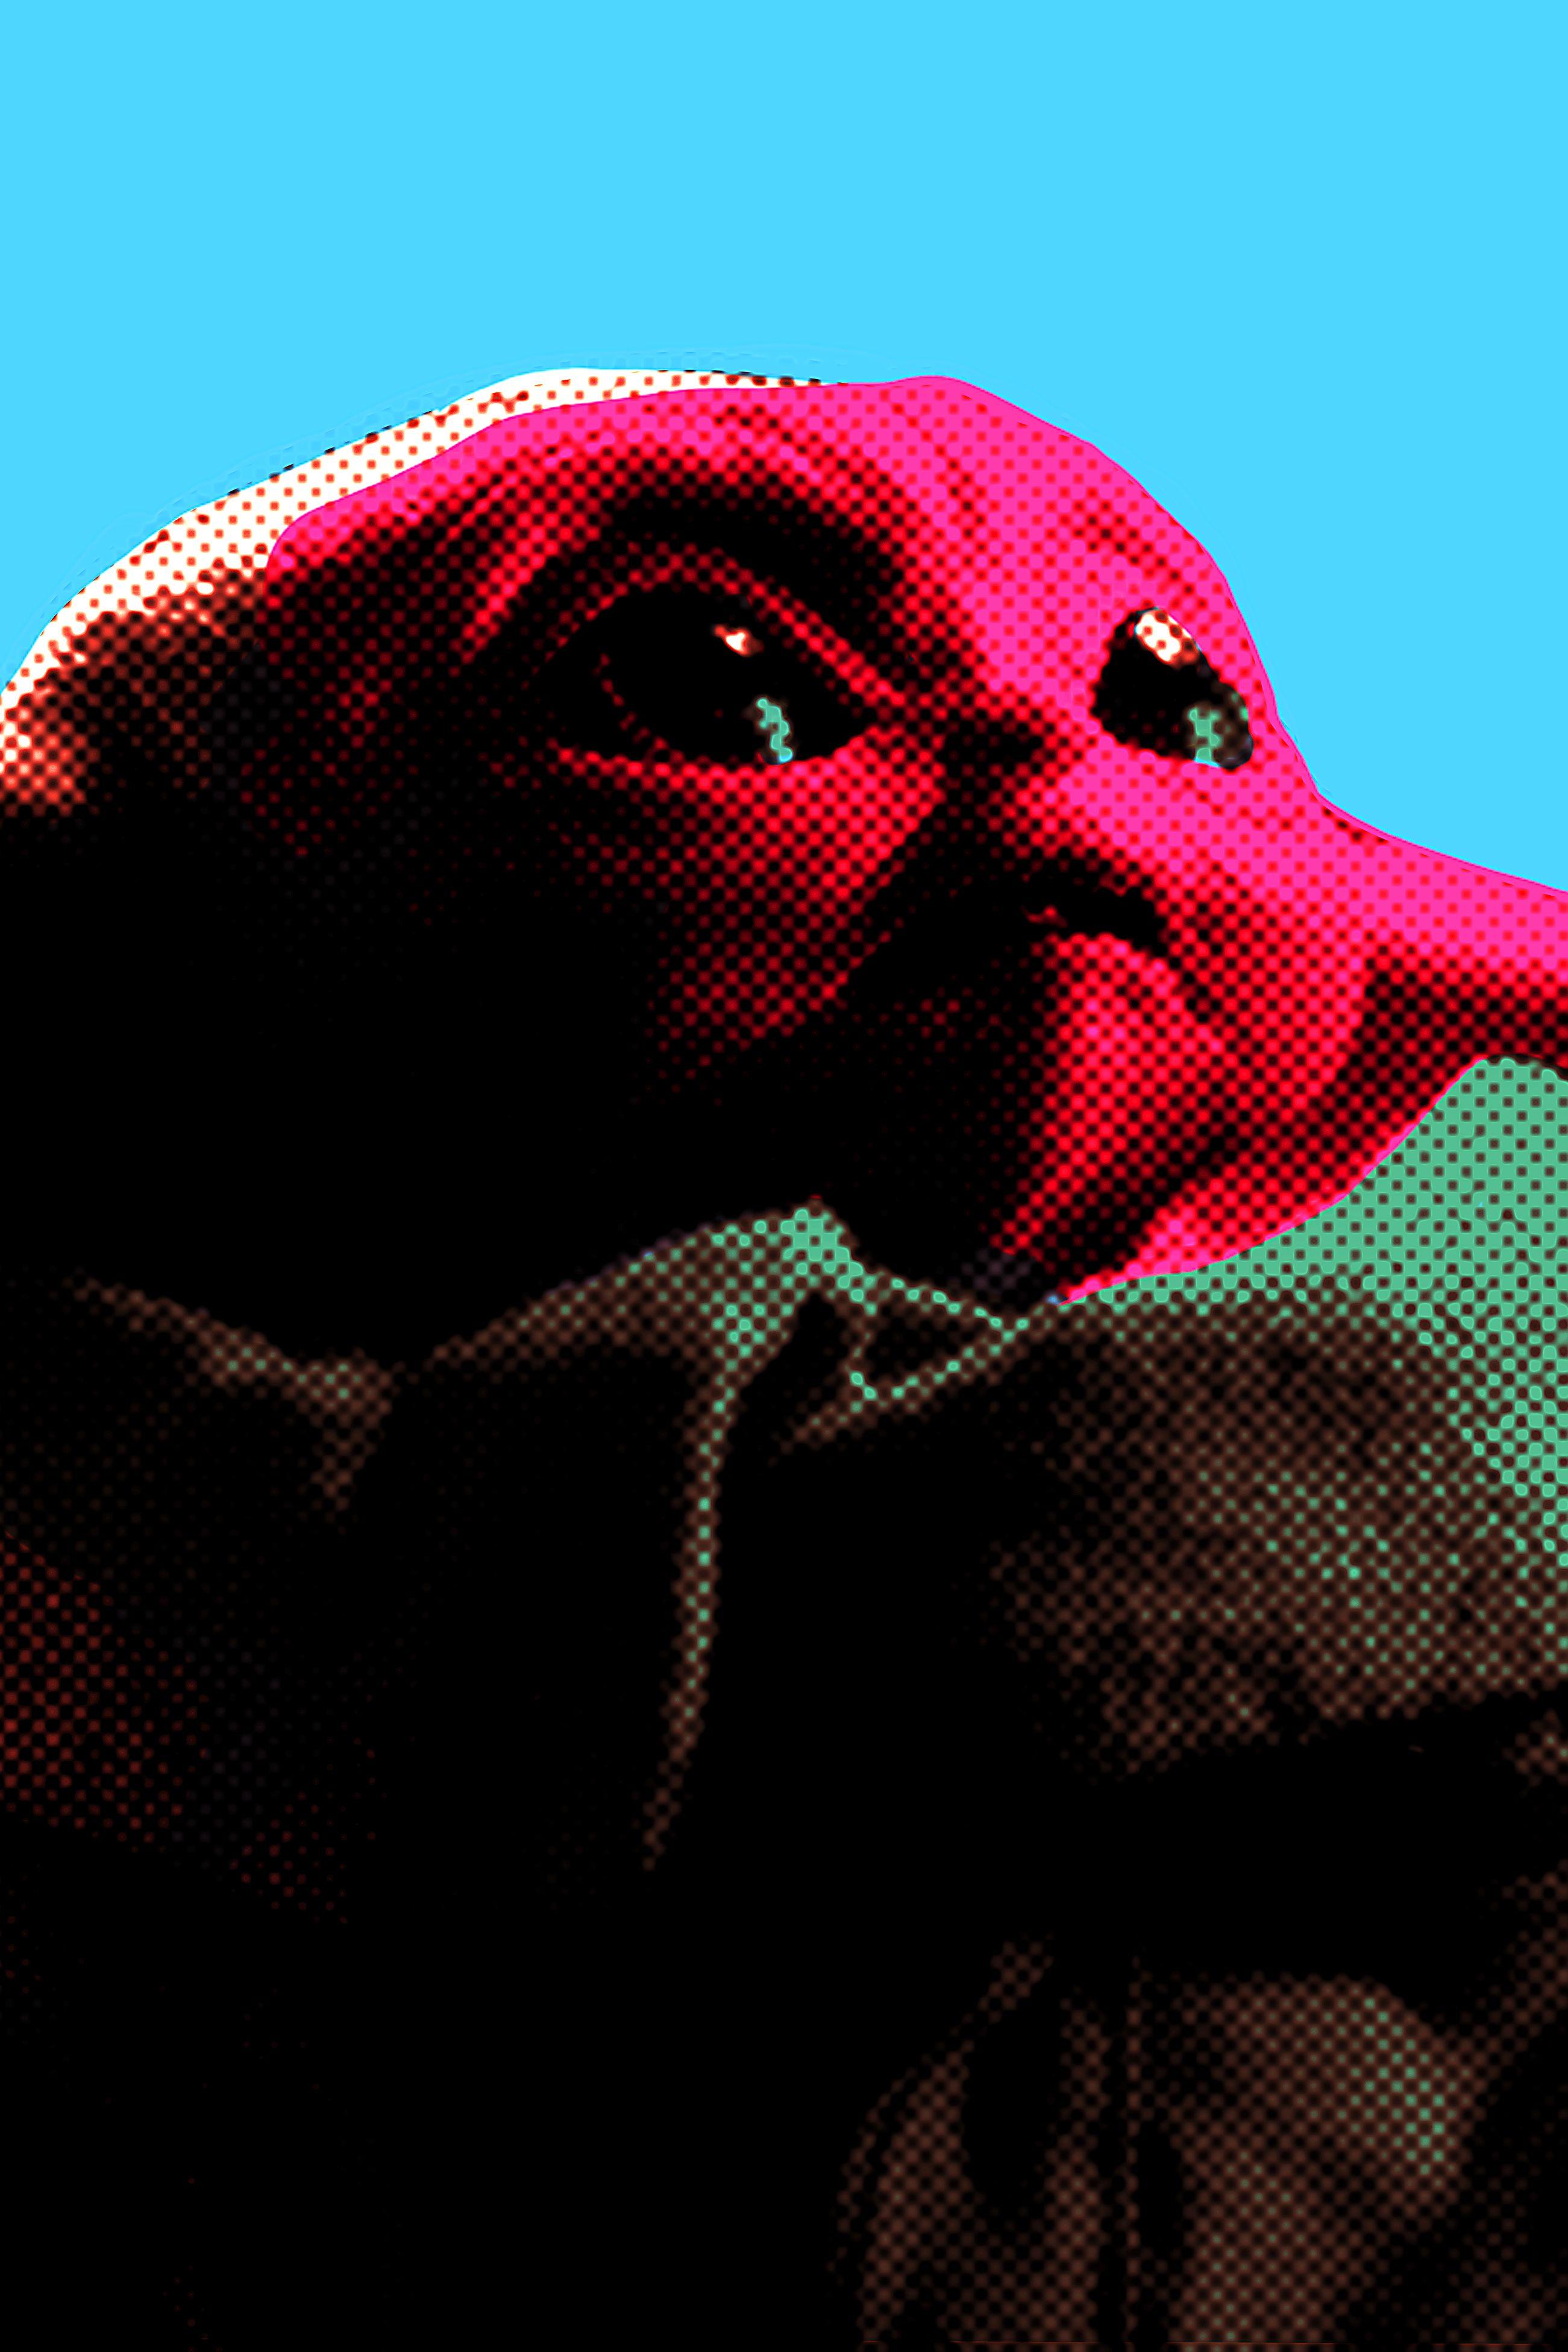 Baby Yoda Wallpaper S10 - Wallpaper